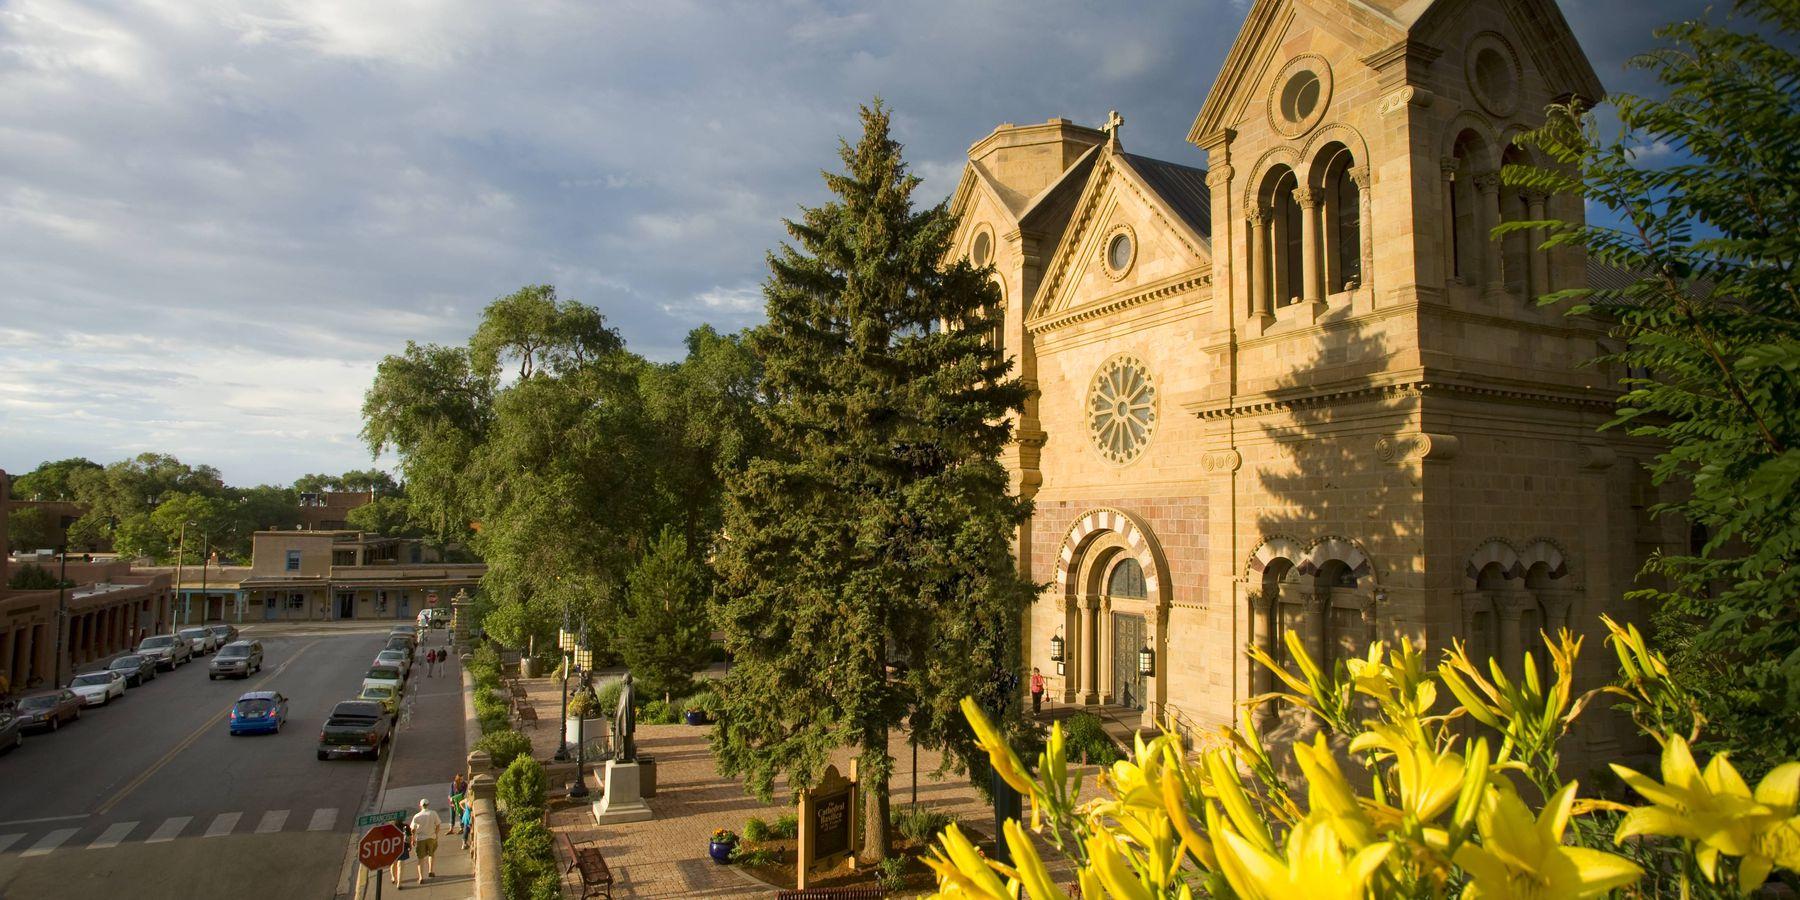 St. Francis Cathedral - Santa Fe - New Mexico - Amerika - Doets Reizen